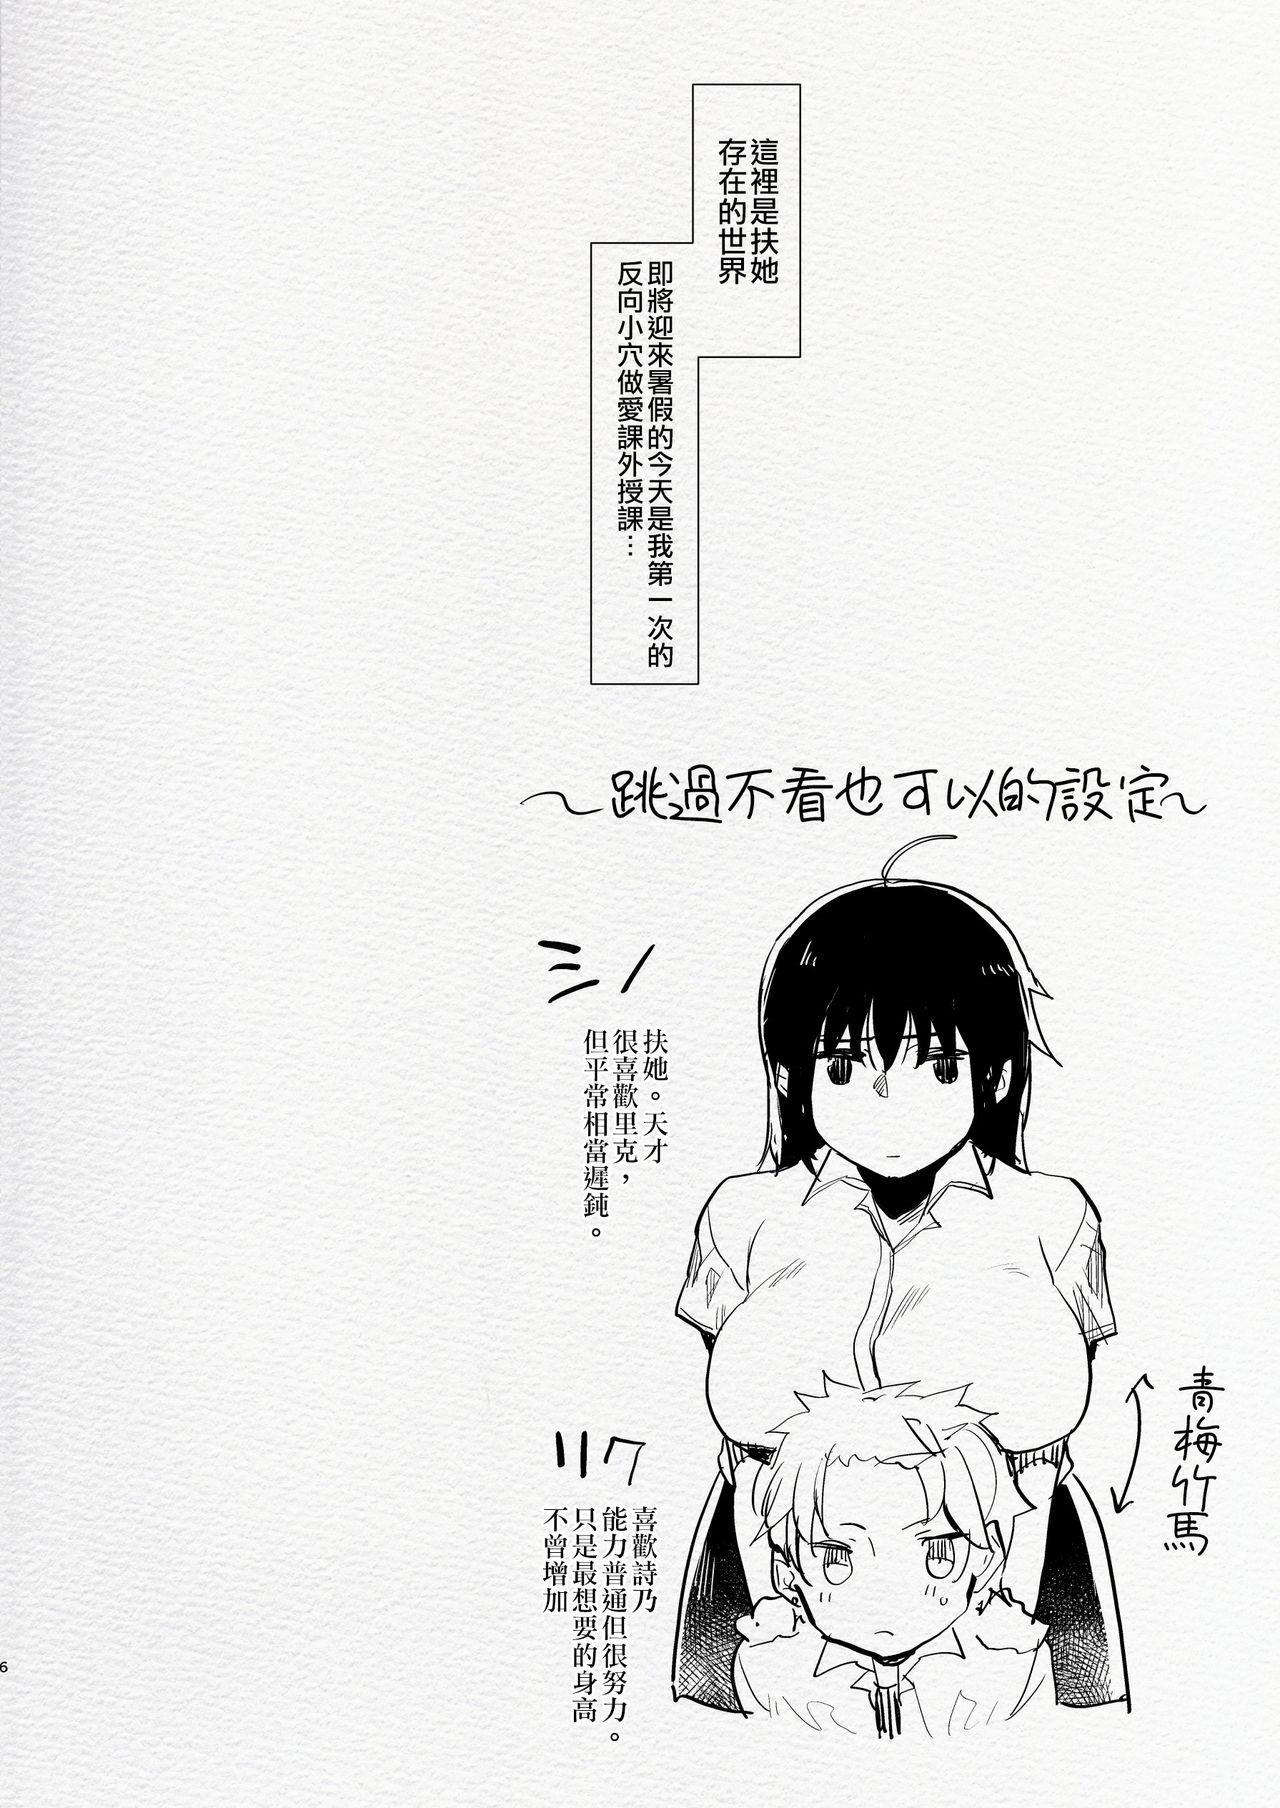 Futanari Osananajimi to Ore to Hajimete no Gyaku Anal Kagai Jugyou 丨扶她青梅竹馬和我第一次的反向小穴做愛課外授課 6